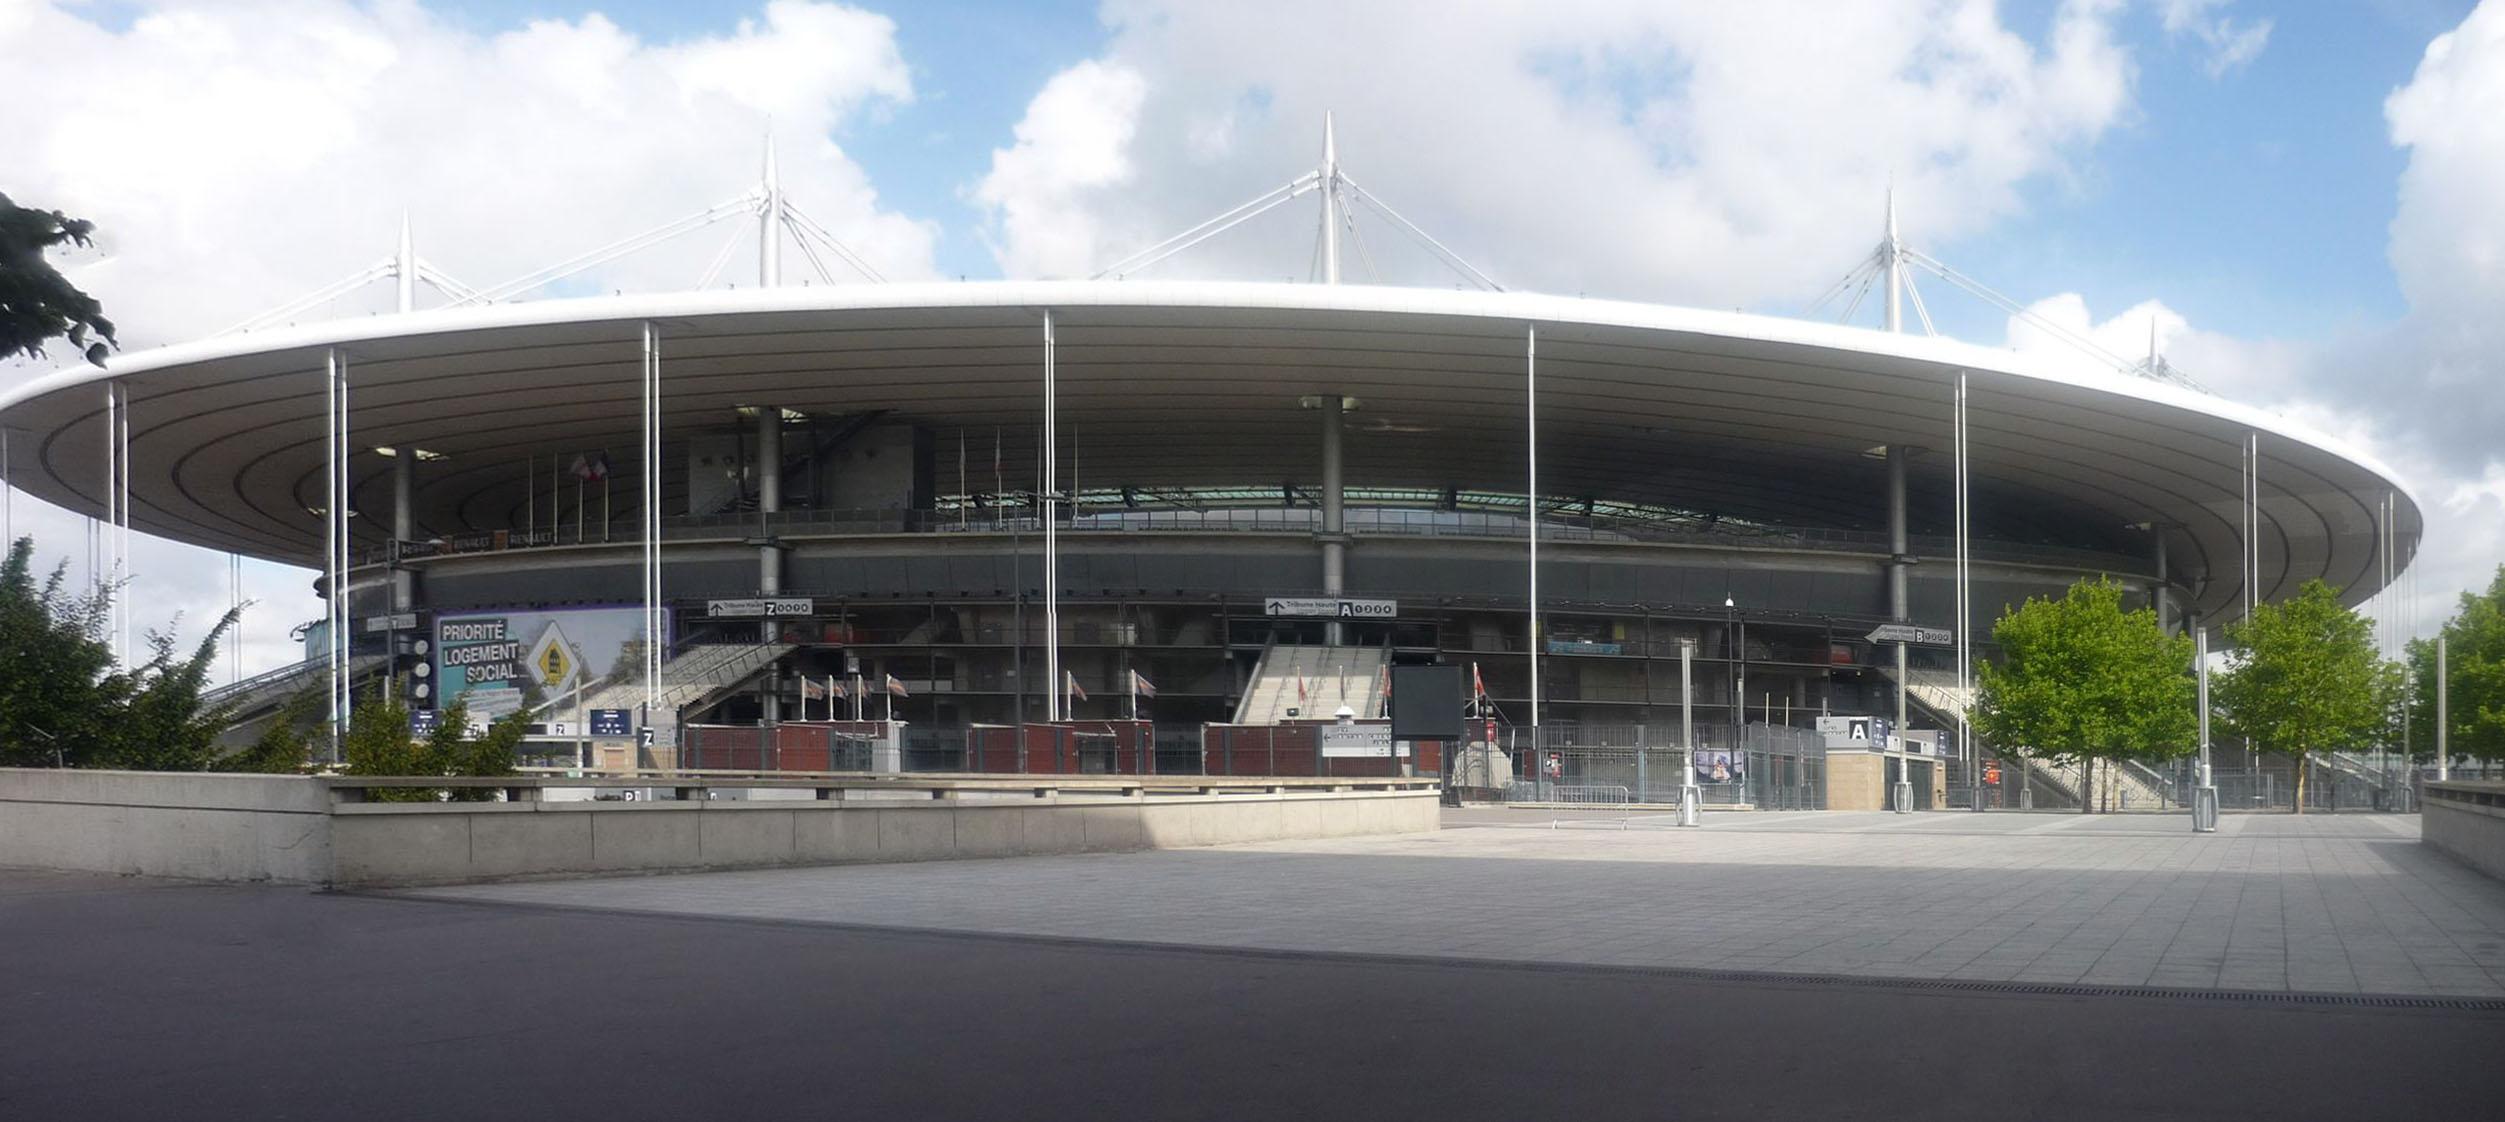 Stade De France Team Building  Juin Pelouse Ouverte